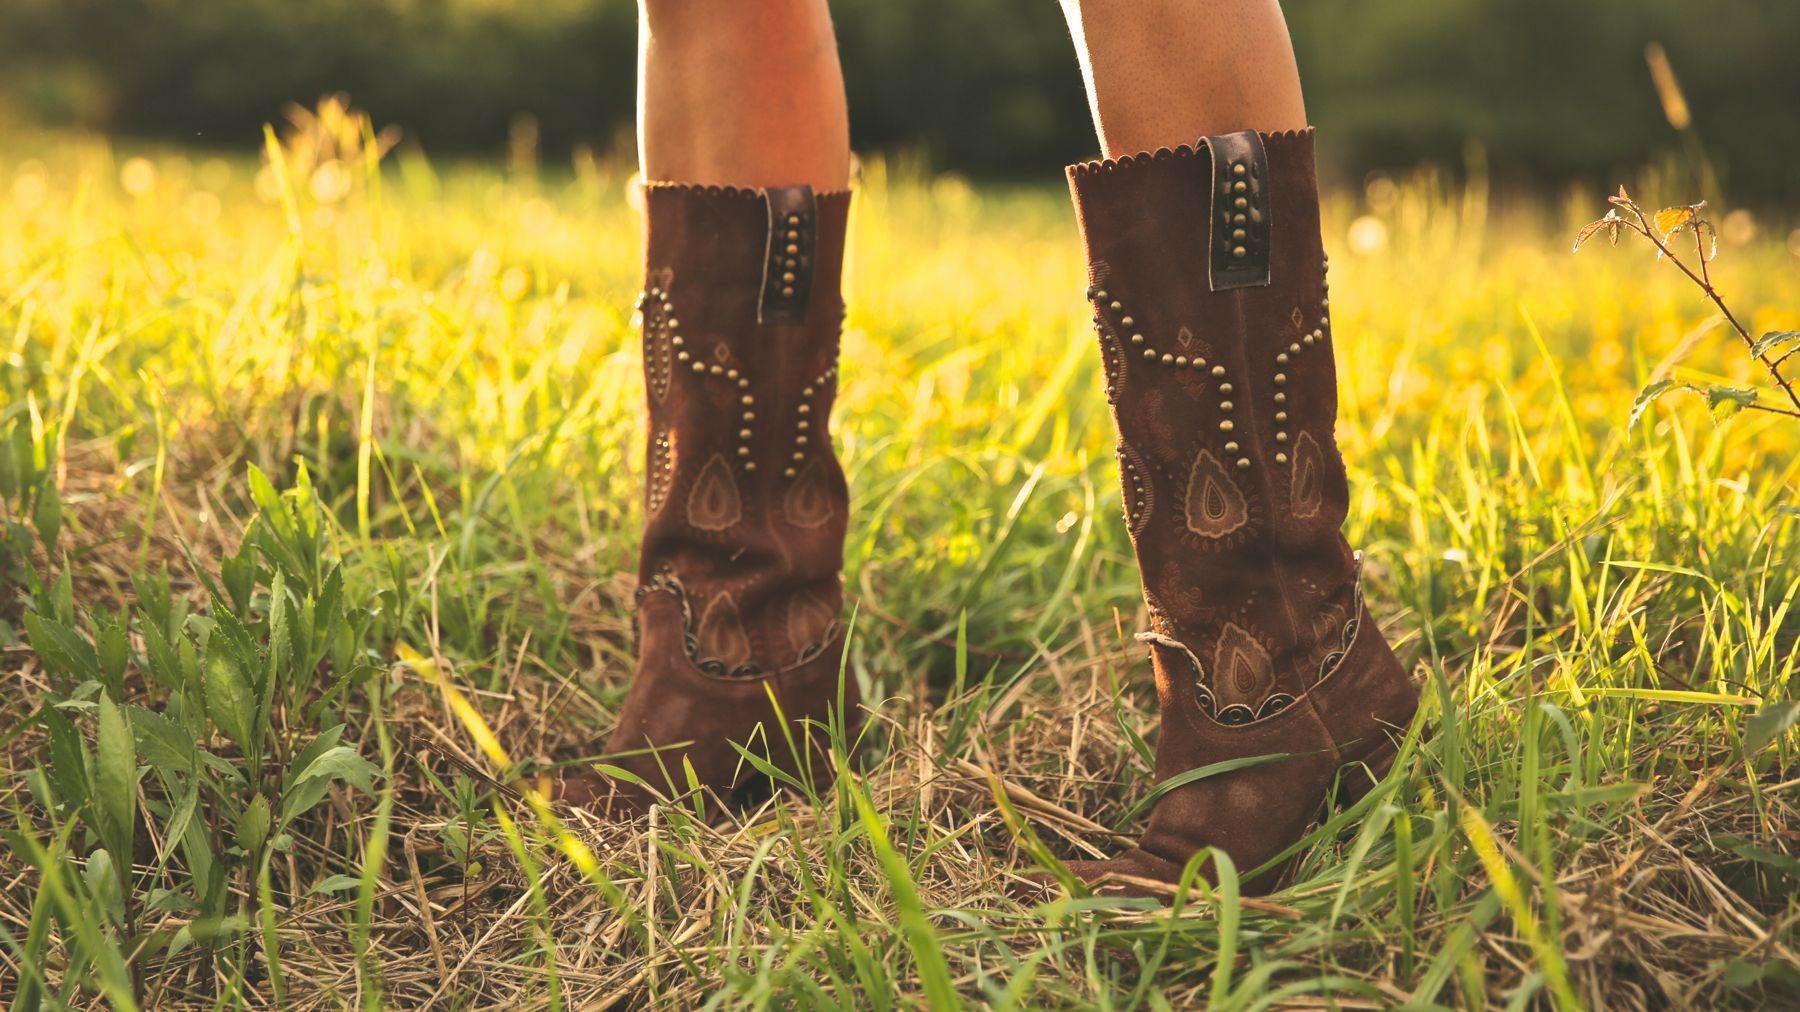 trendy_taste-look-outfit-street_style-ootd-blog-blogger-fashion_spain-moda_españa-cowboy-campero-sendra-cowboy_boots-botas_camperas-loewe-bag-bolso-vestido_flores-flower_print-dress-2